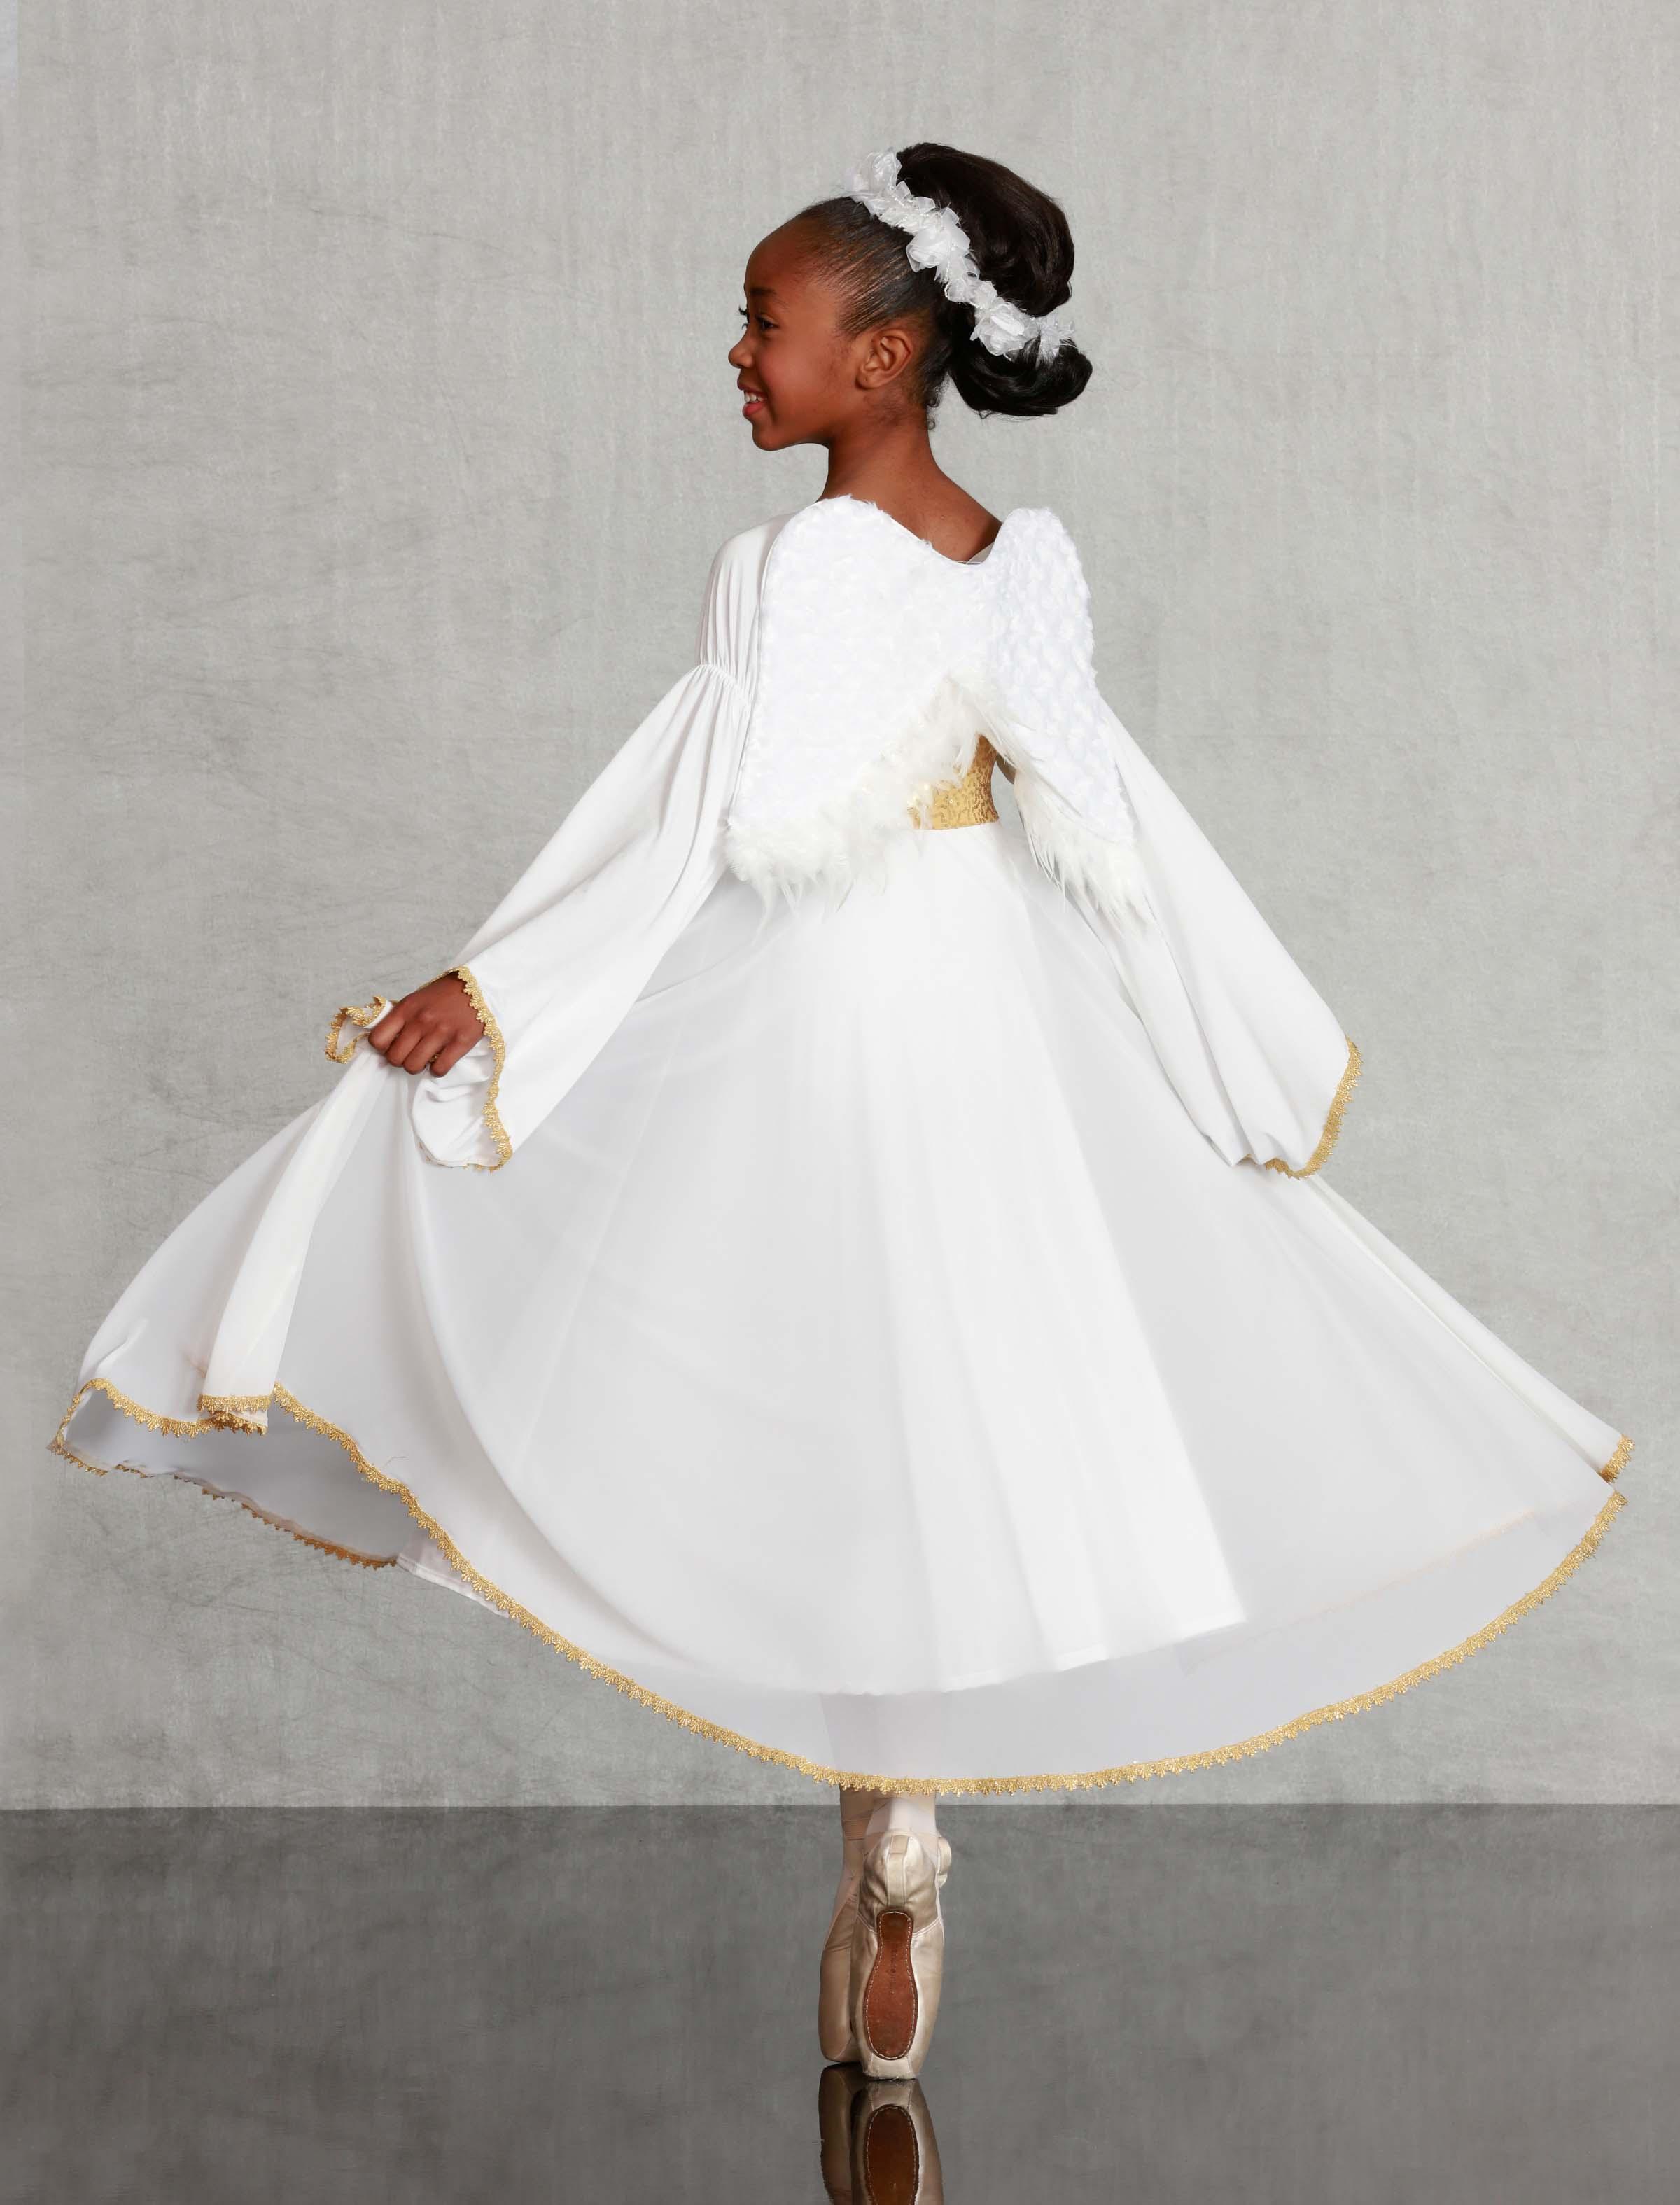 Georgie Girl Costumes Nutcracker Angels